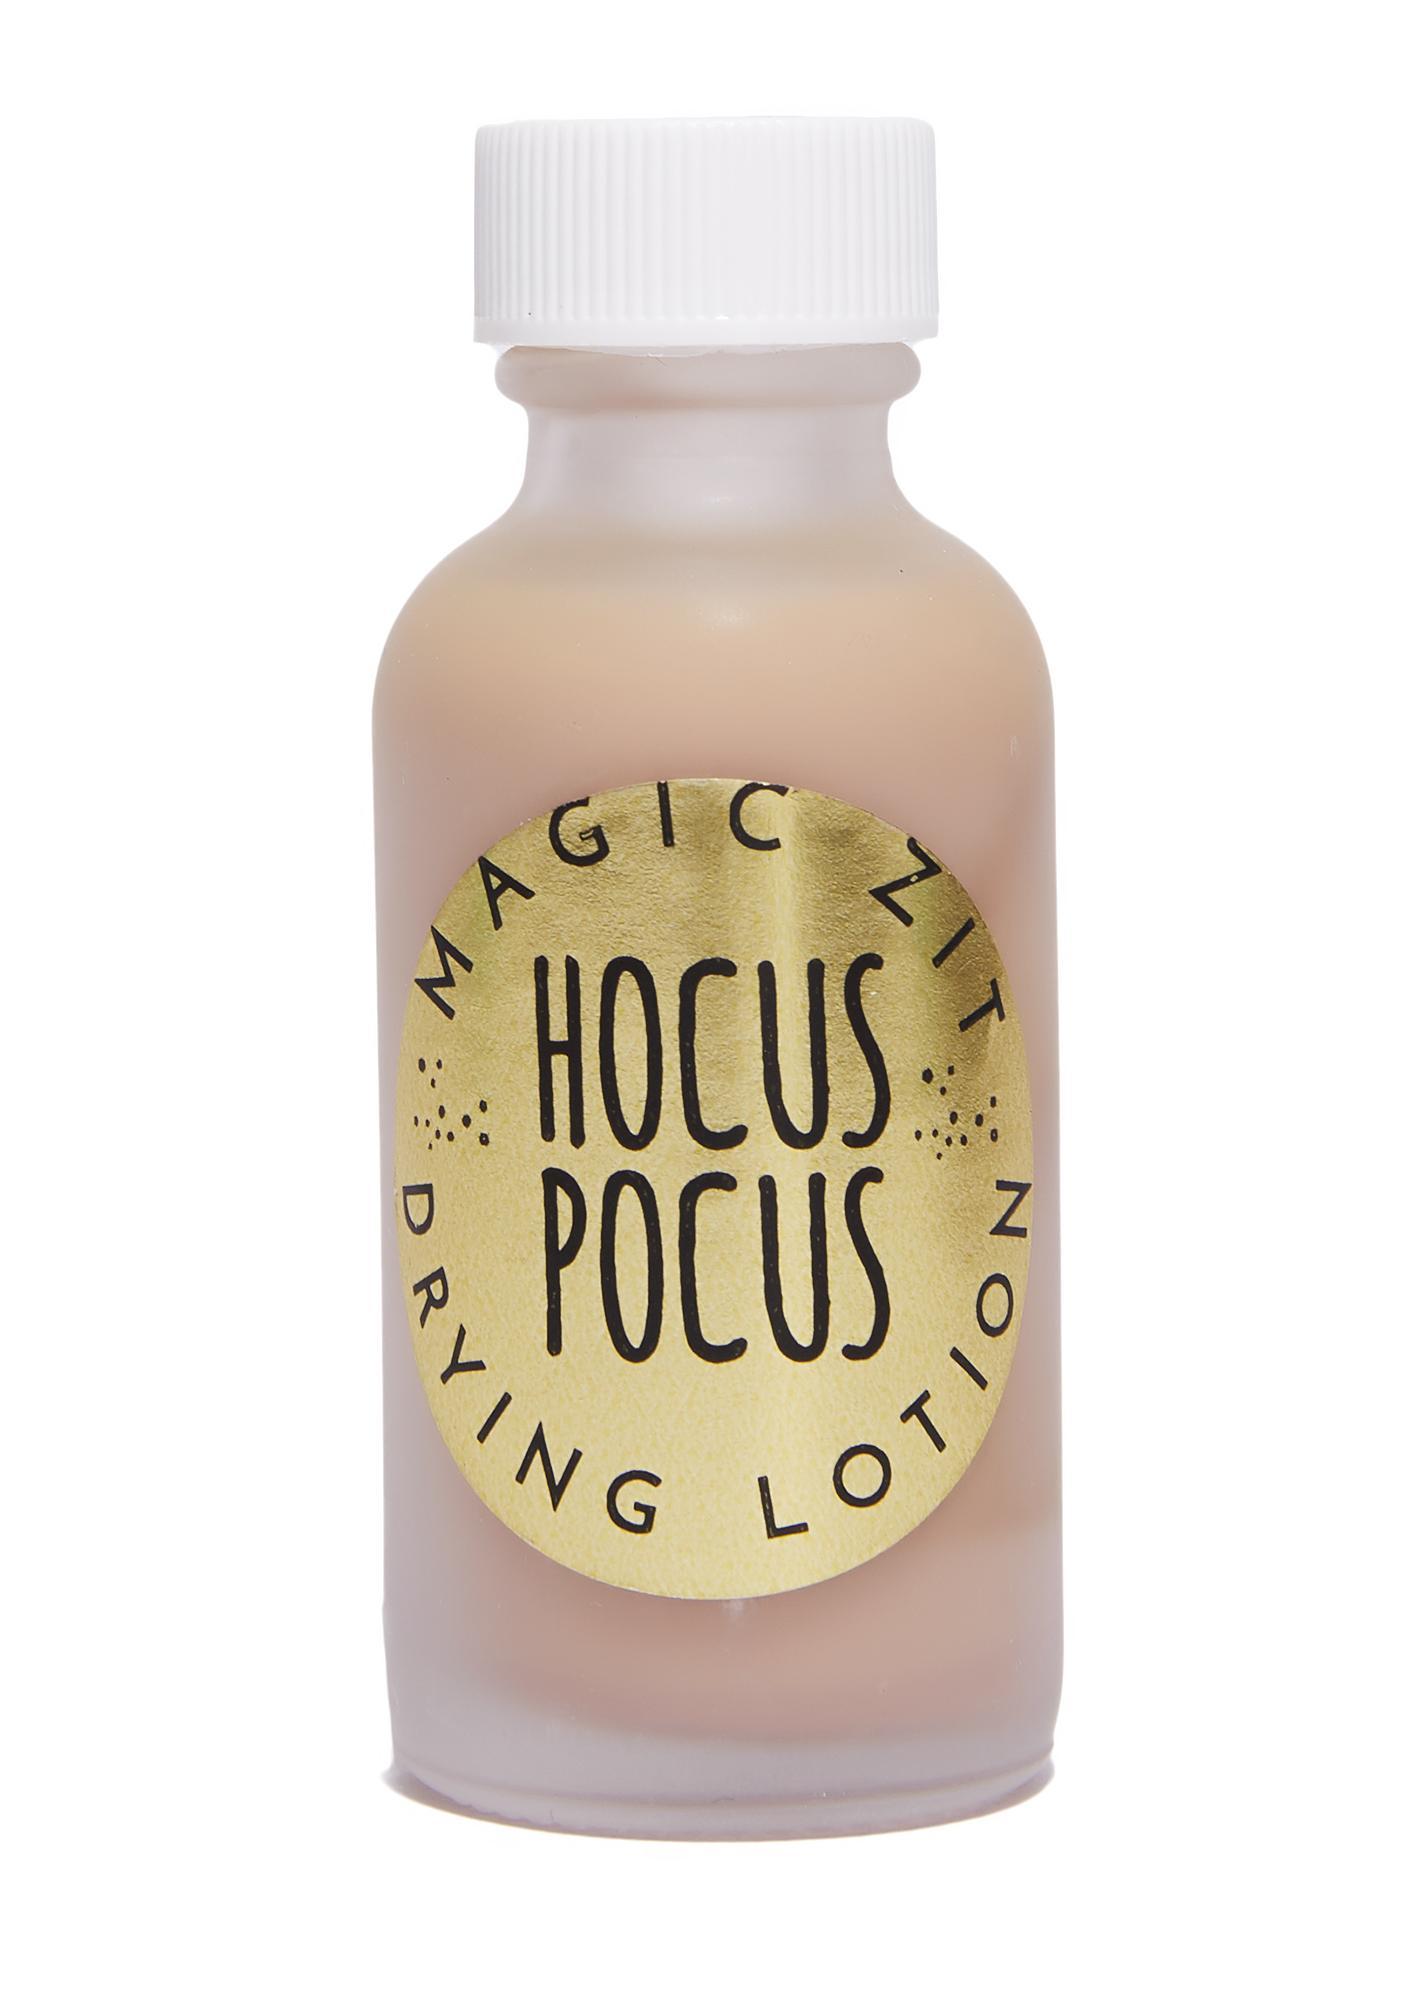 Little Shop of Oils Hocus Pocus Drying Lotion